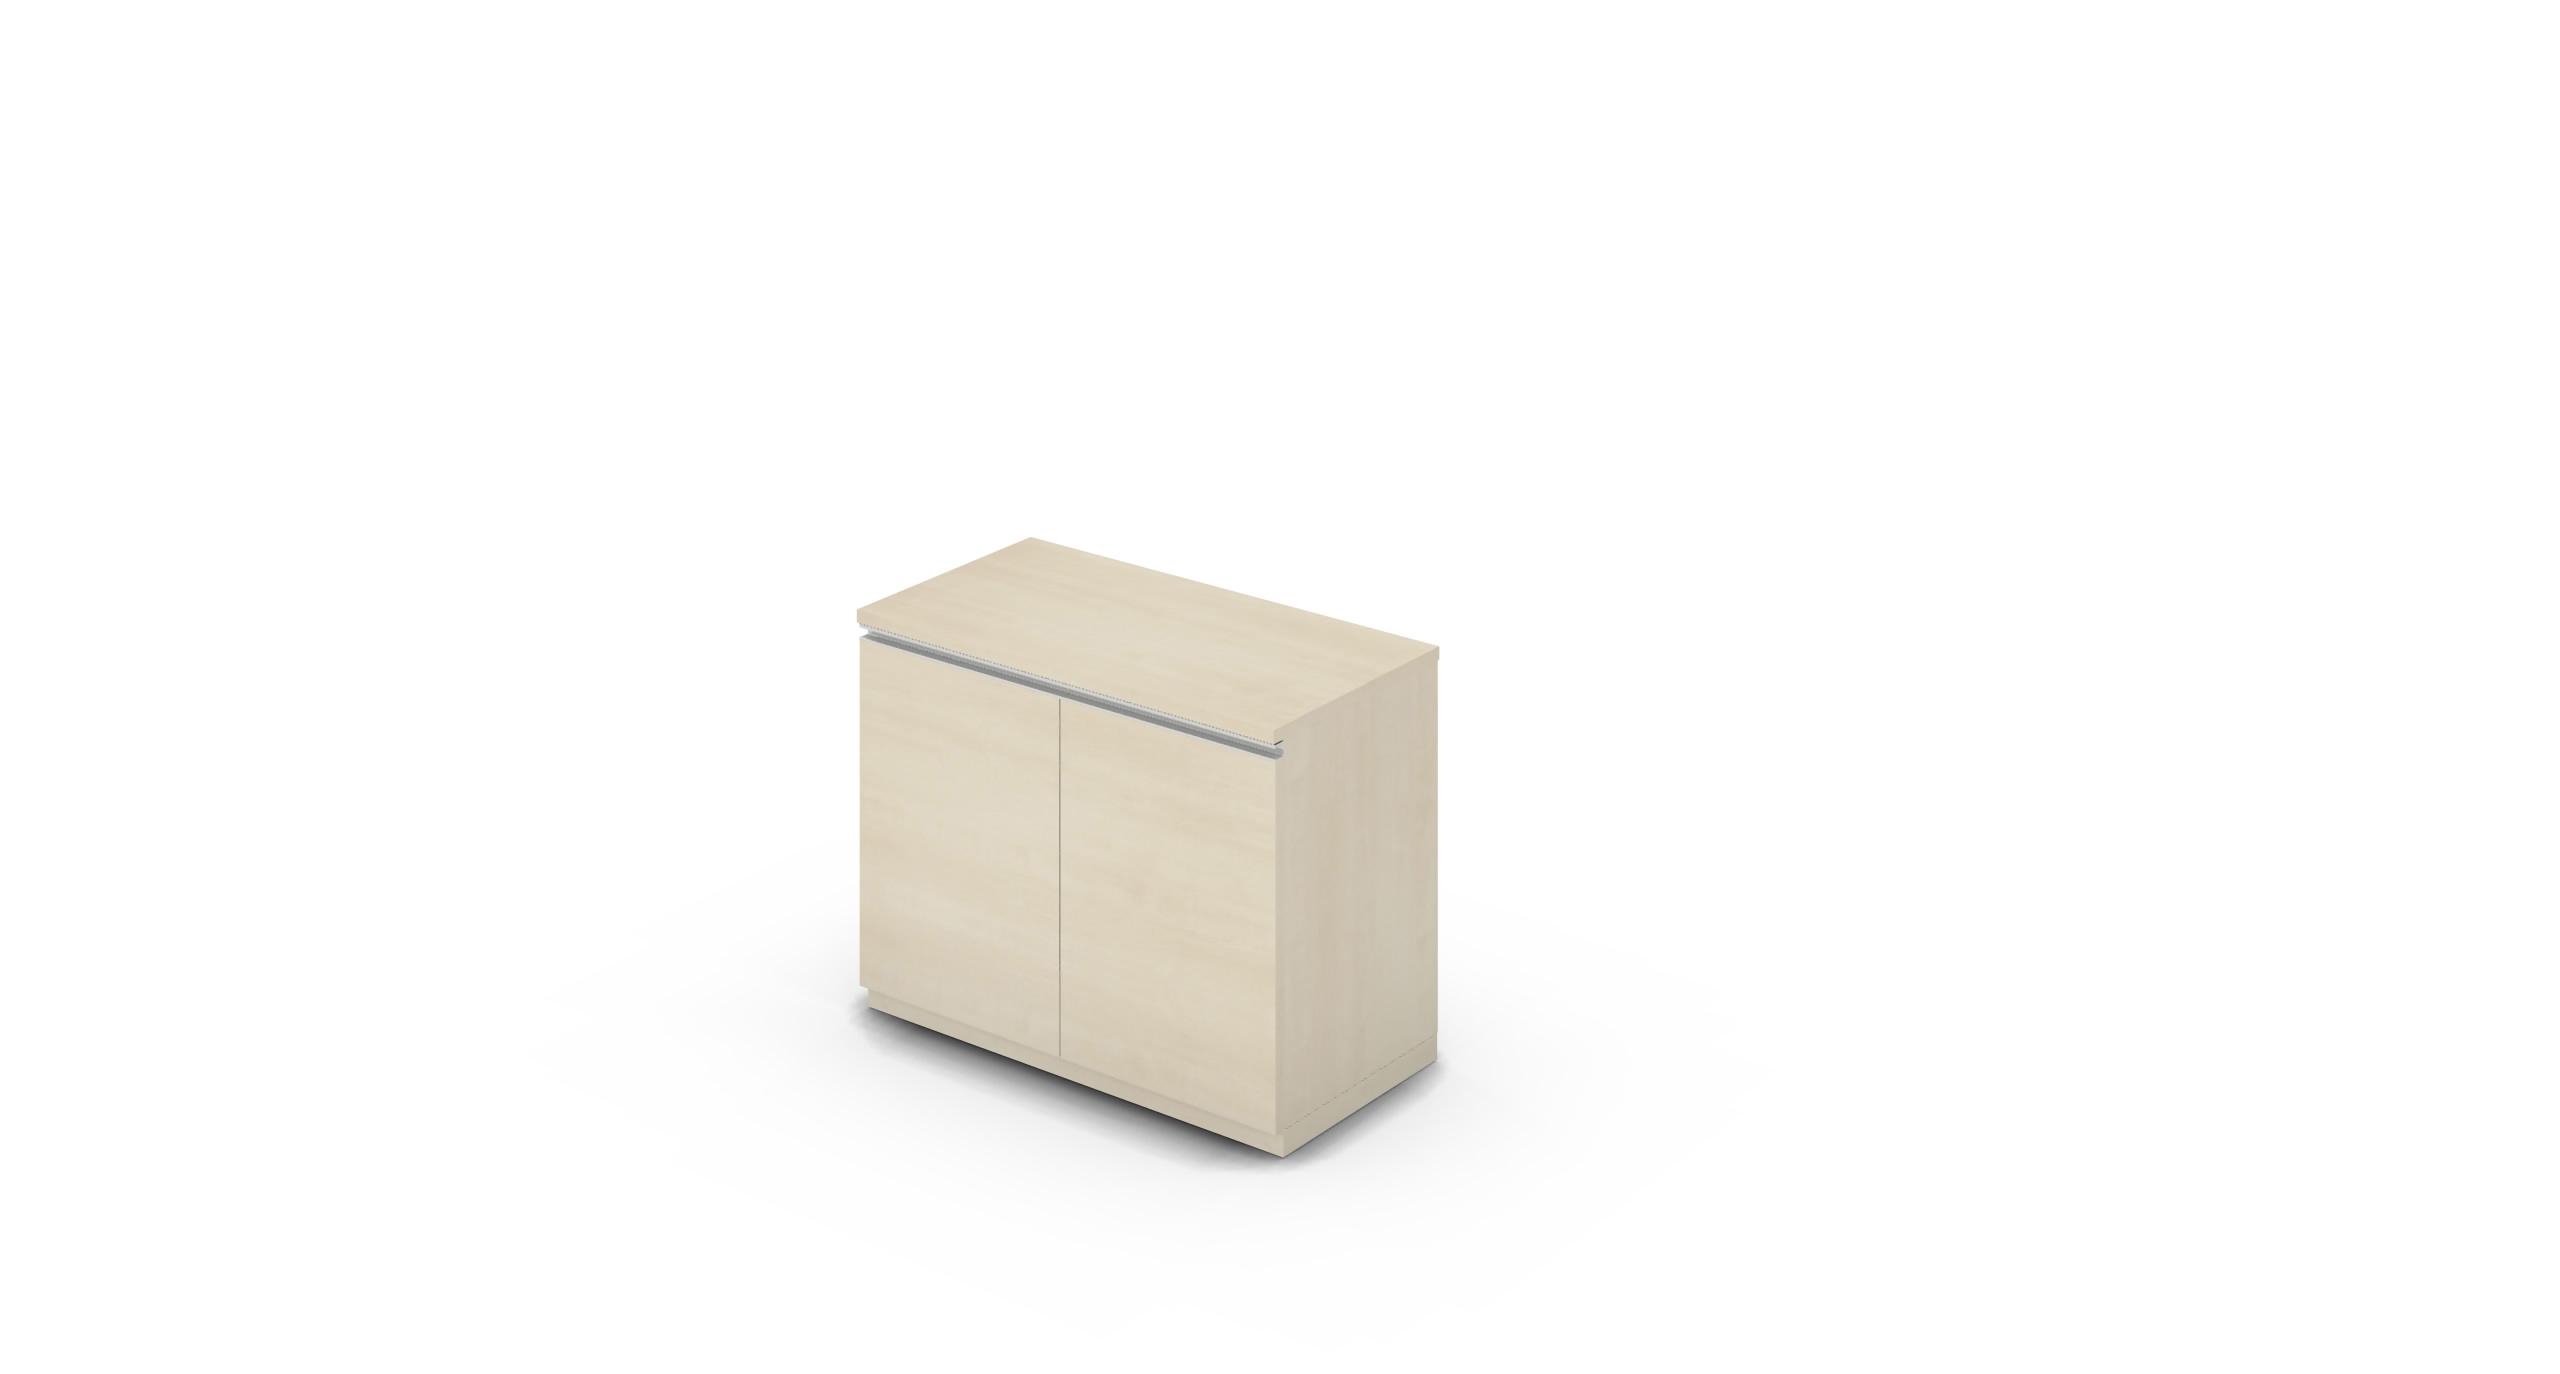 Cabinet_900x450x775_HD_Maple_Rail_NoCylinder